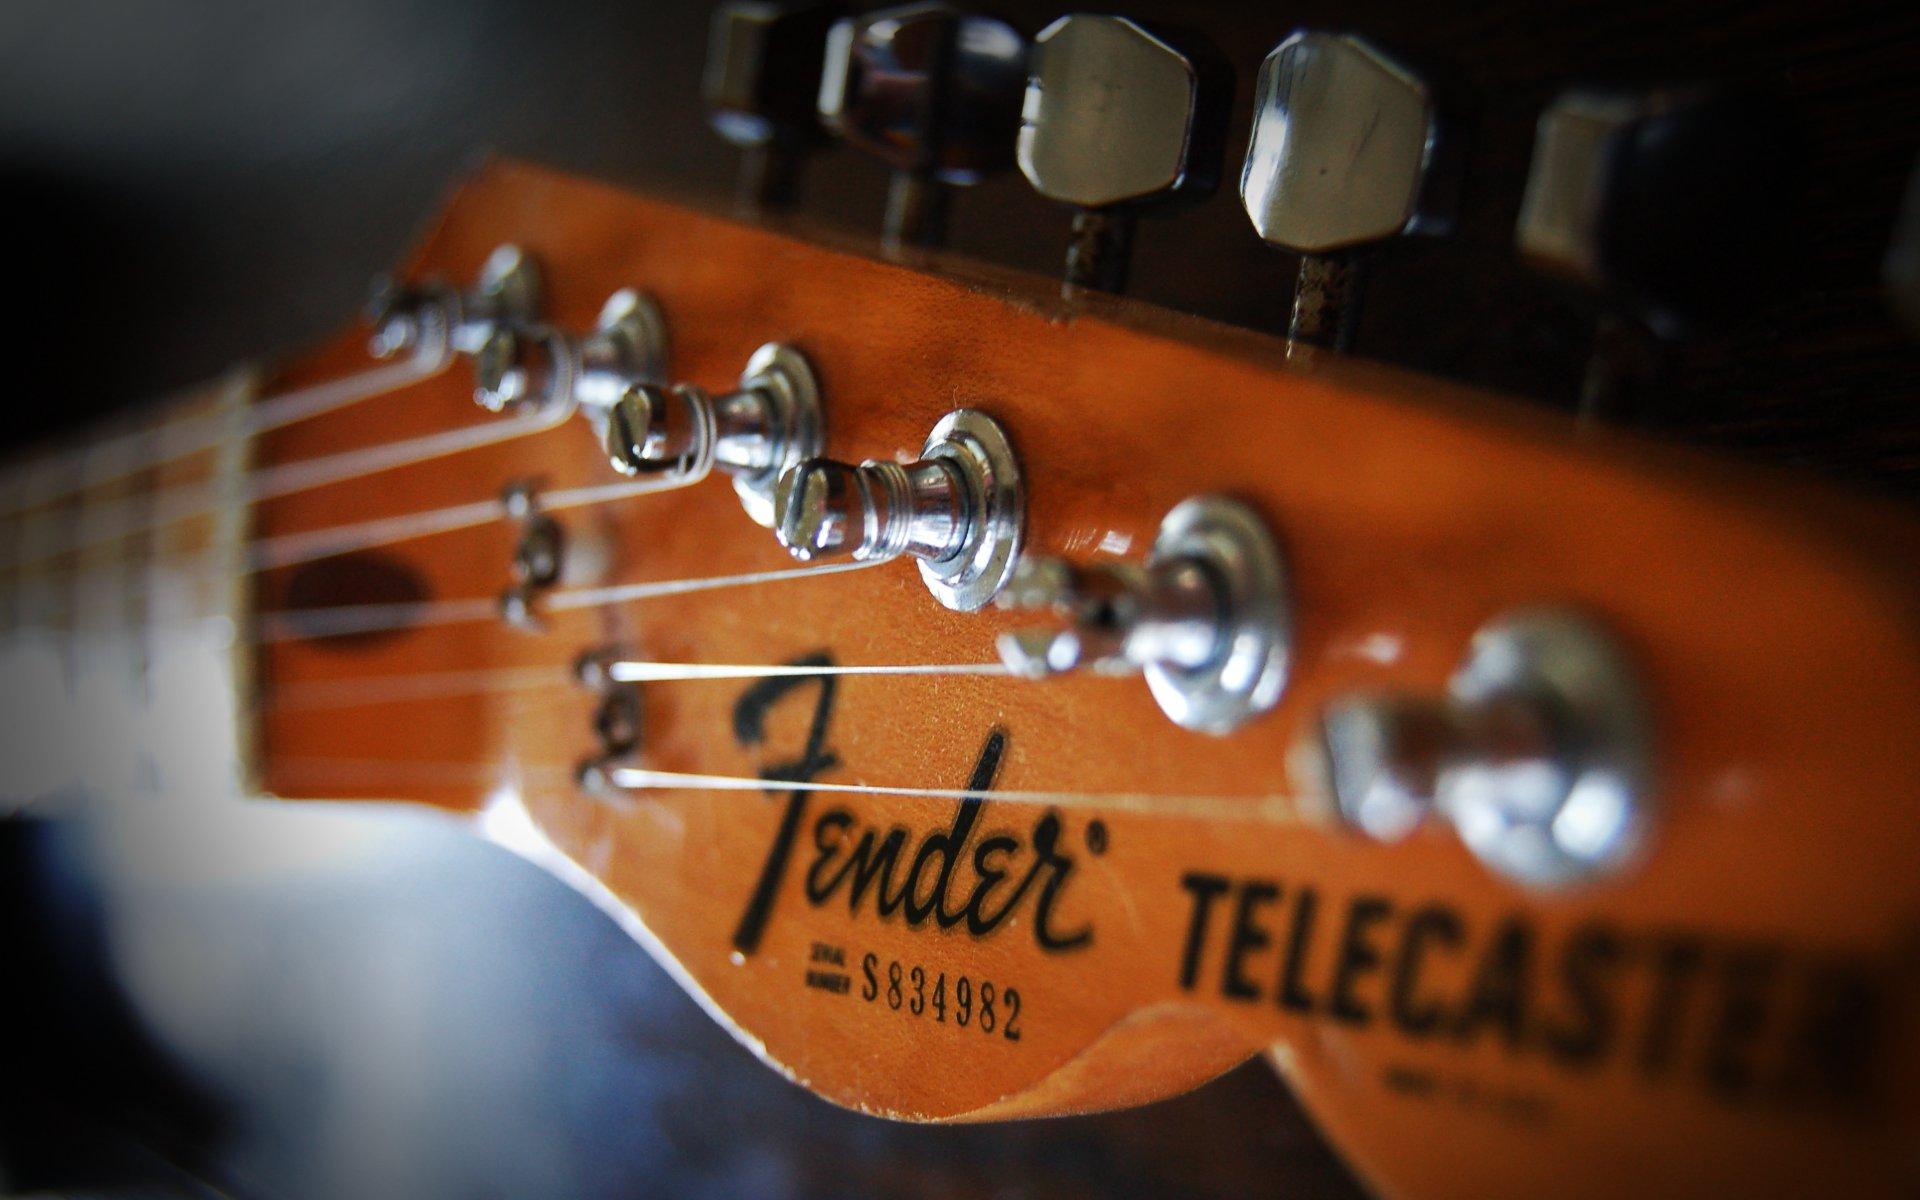 Guitar Fender Wallpaper 14118 Hd Wallpapers in Music   Imagescicom 1920x1200